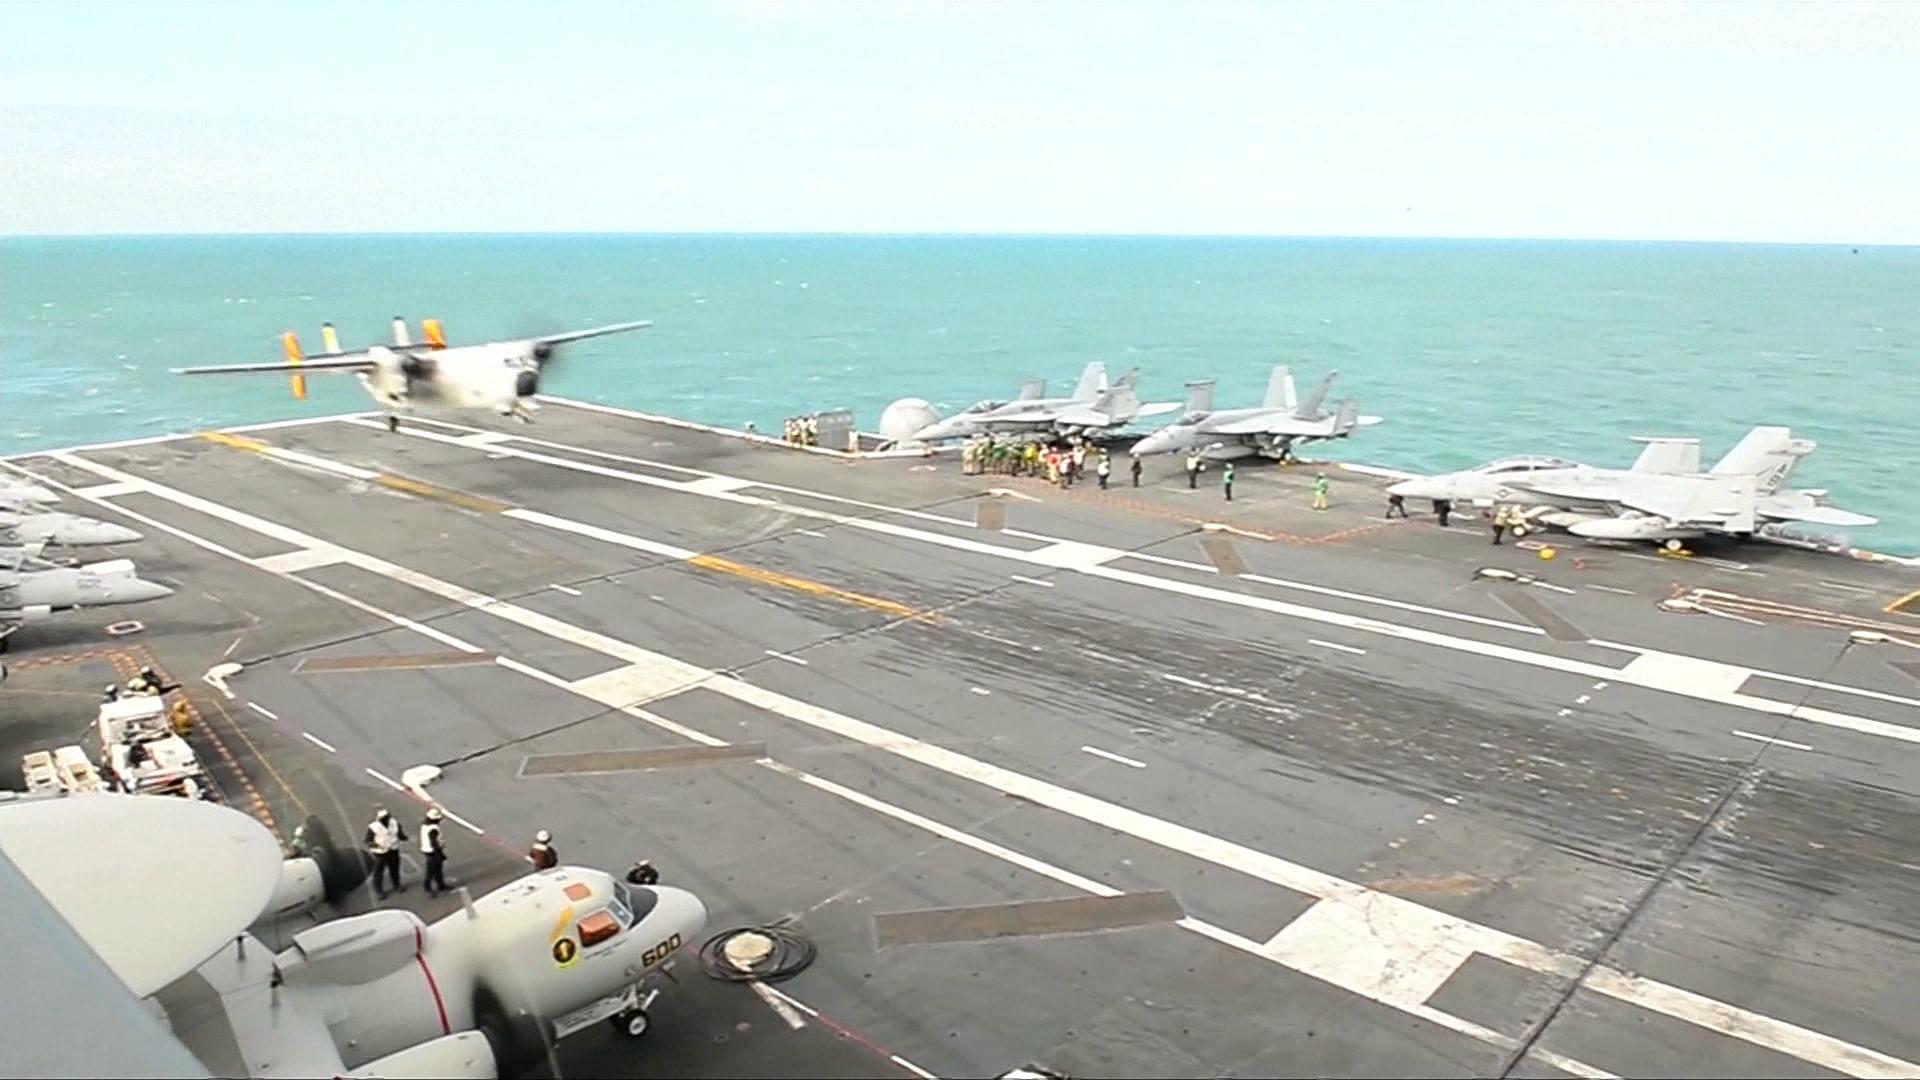 US moves to block Iranian ships off Yemen